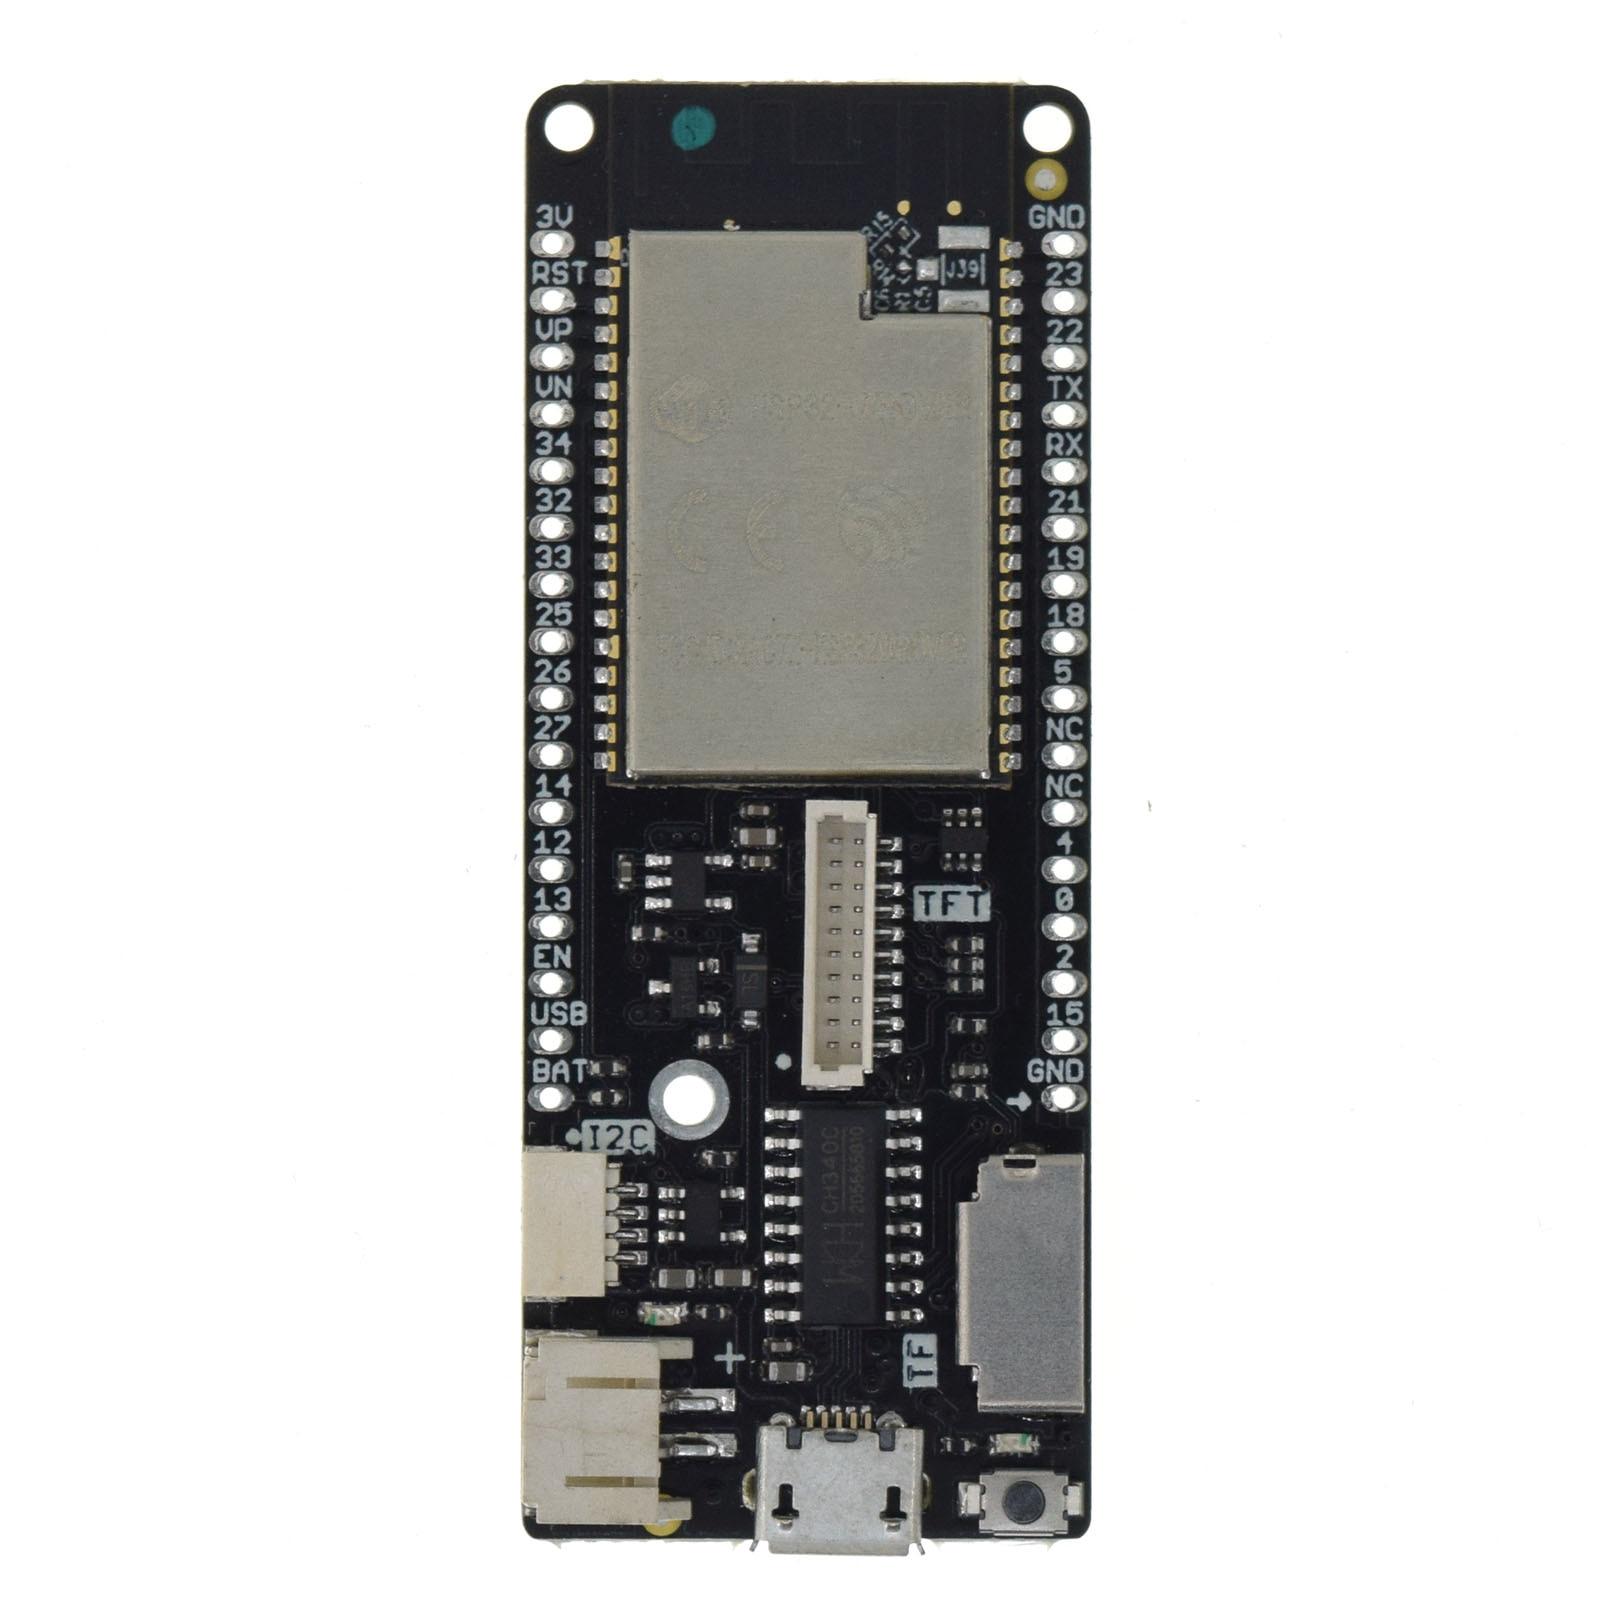 LOLIN D32 Pro V2.0.0 - Wifi & Bluetooth Board Based ESP-32 Esp32 Rev1 ESP32-WROVER 16MB 8MB 4MB FLASH PSRAM MicroPython